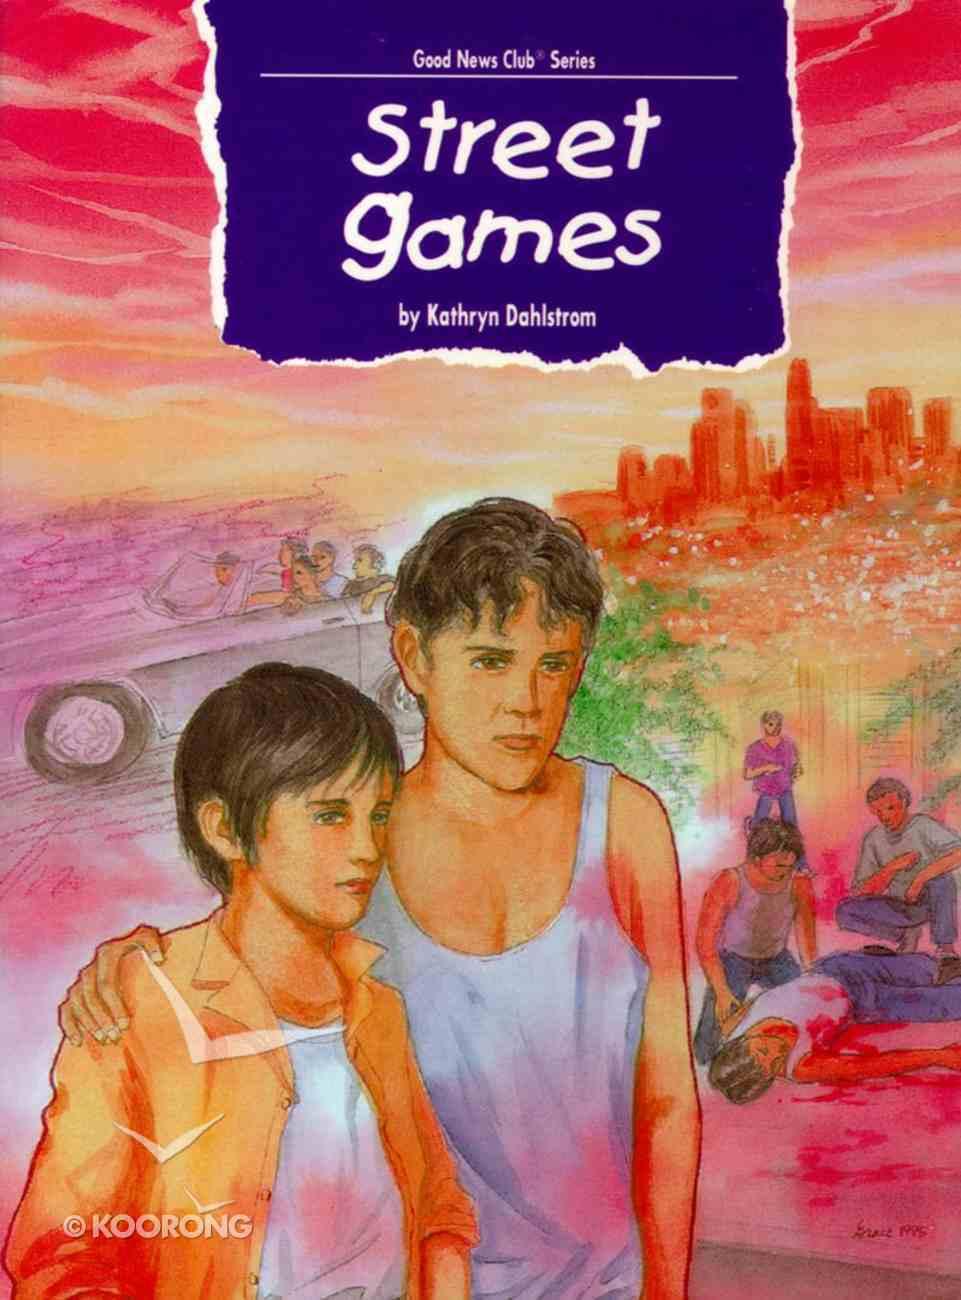 Gnc: Street Games (Good New Club Series) Paperback